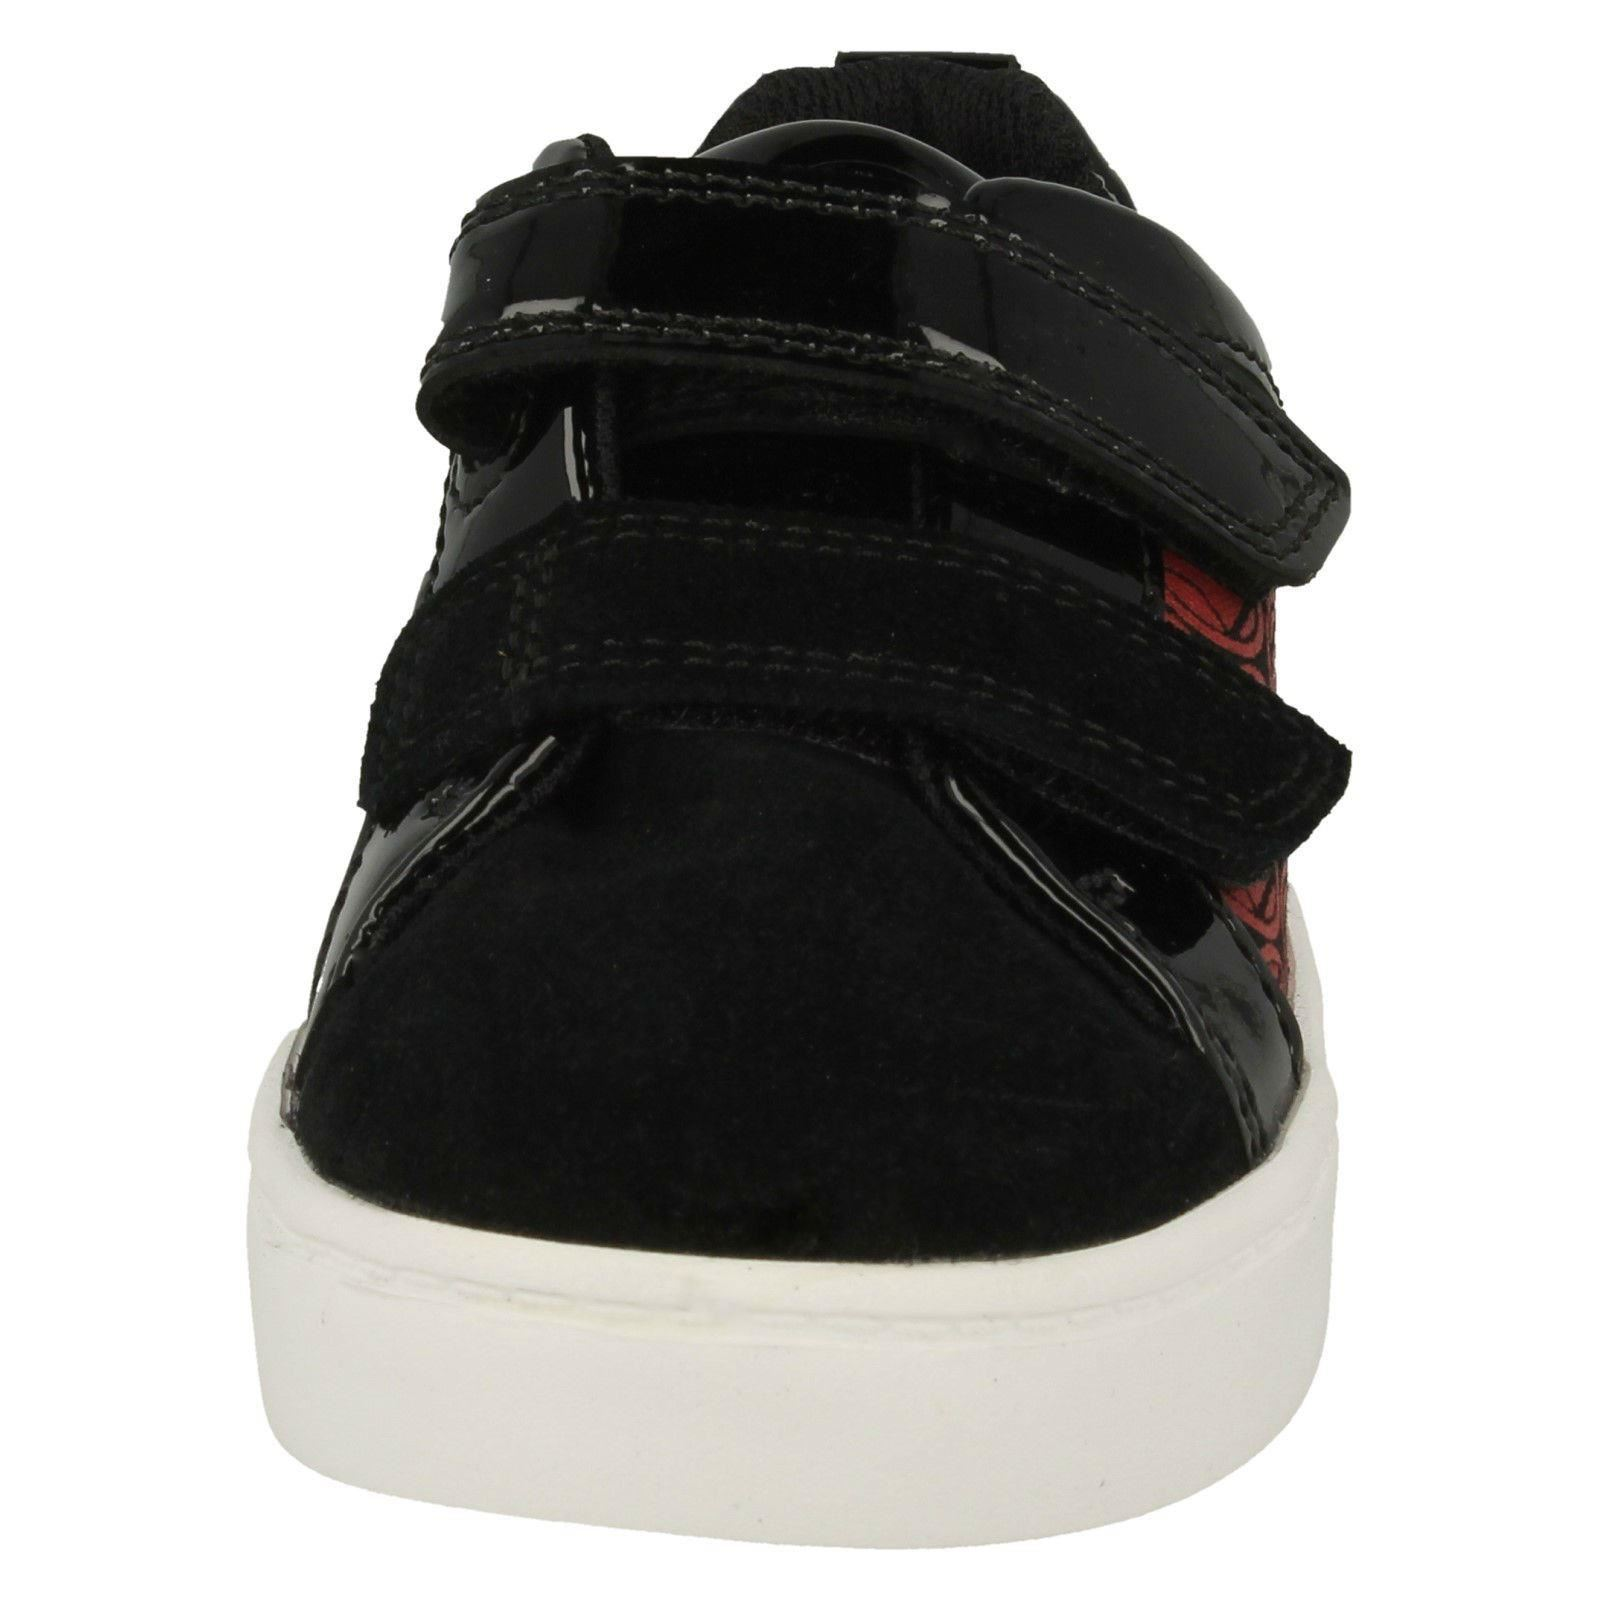 City Hero Lo Clarks Boys Casual Shoes